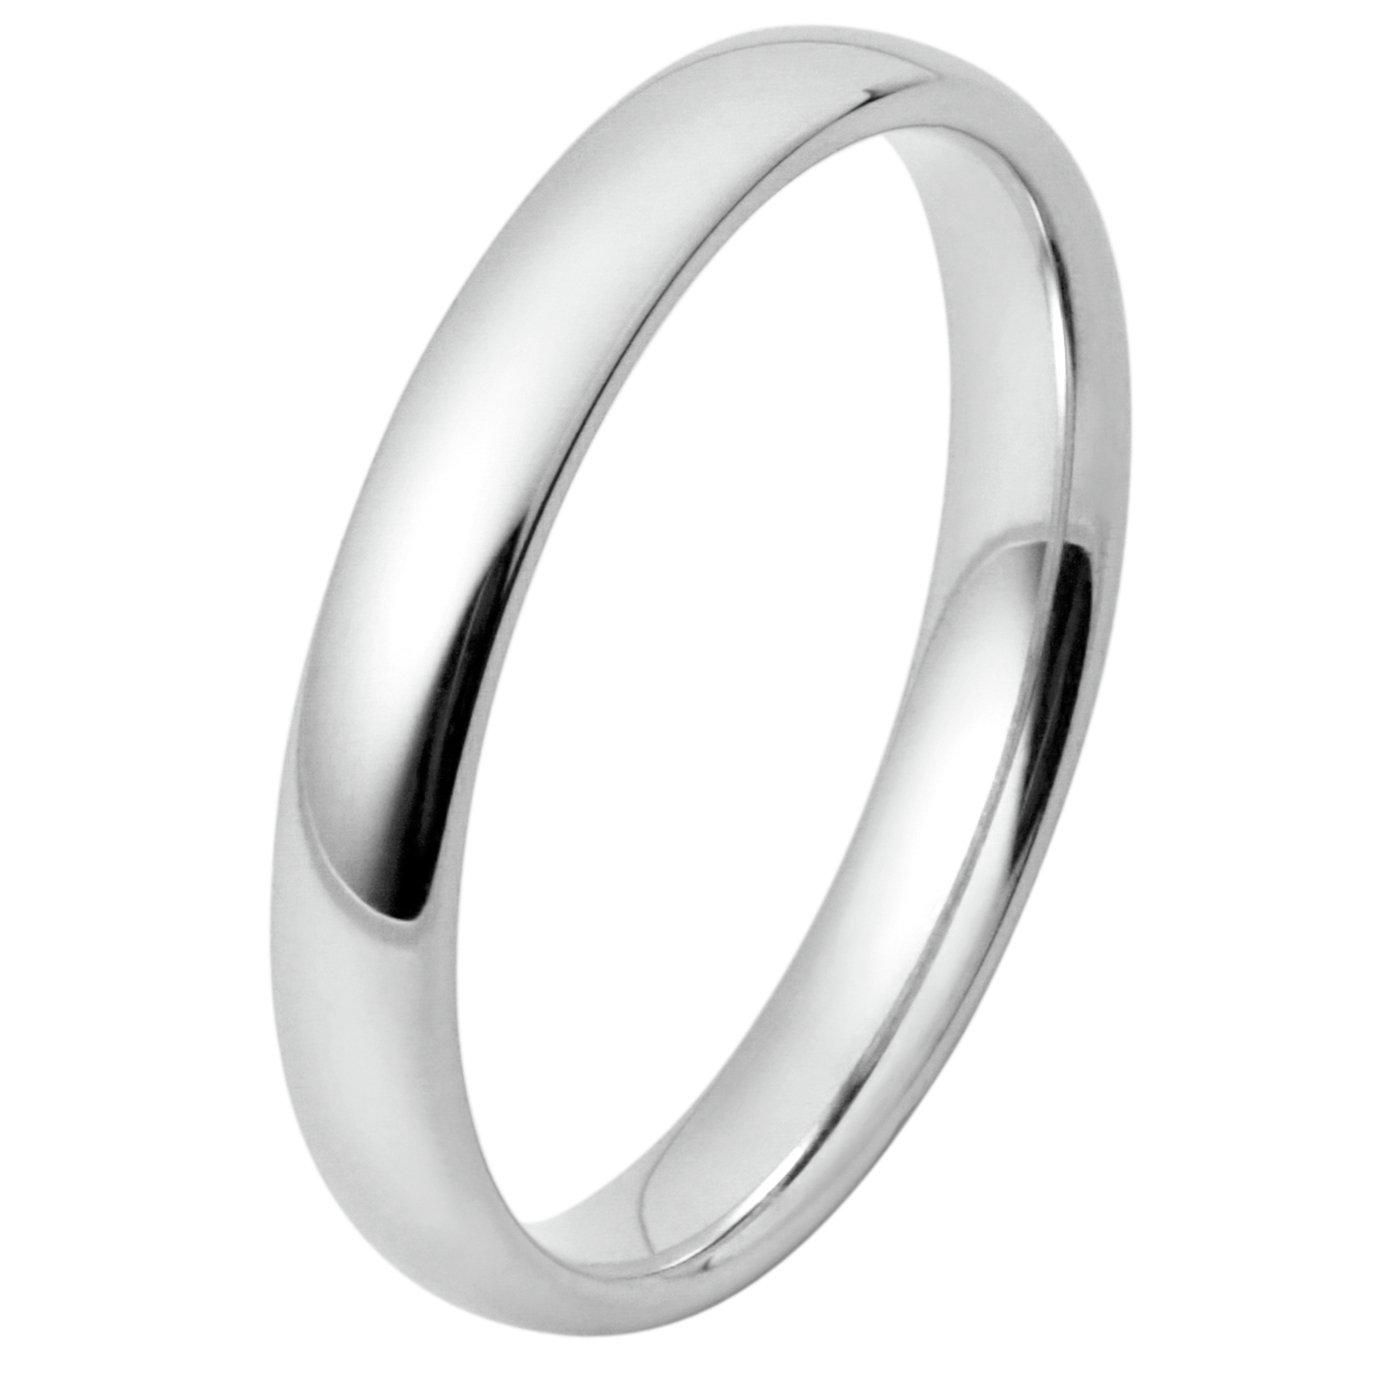 Inara Rhodium Plated Ceramic 3mm Stacking Ring